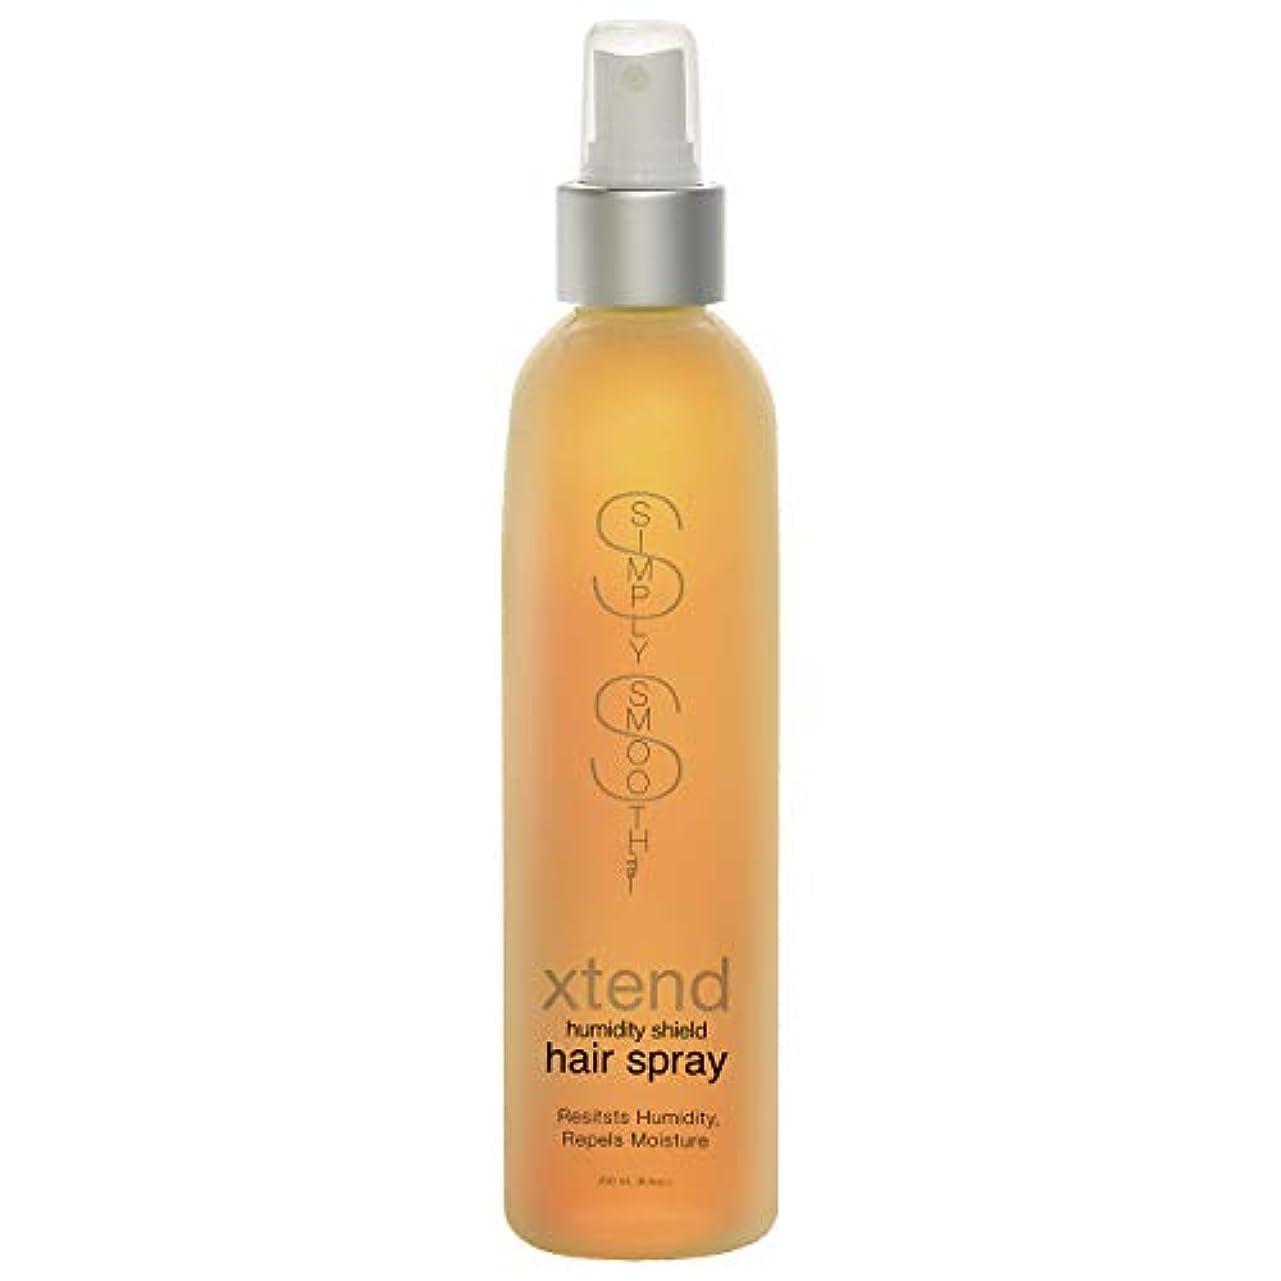 家族広々失効Simply Smooth Xtend Humidity Shield Hairspray(Non-Aero) 8 oz. (並行輸入品)